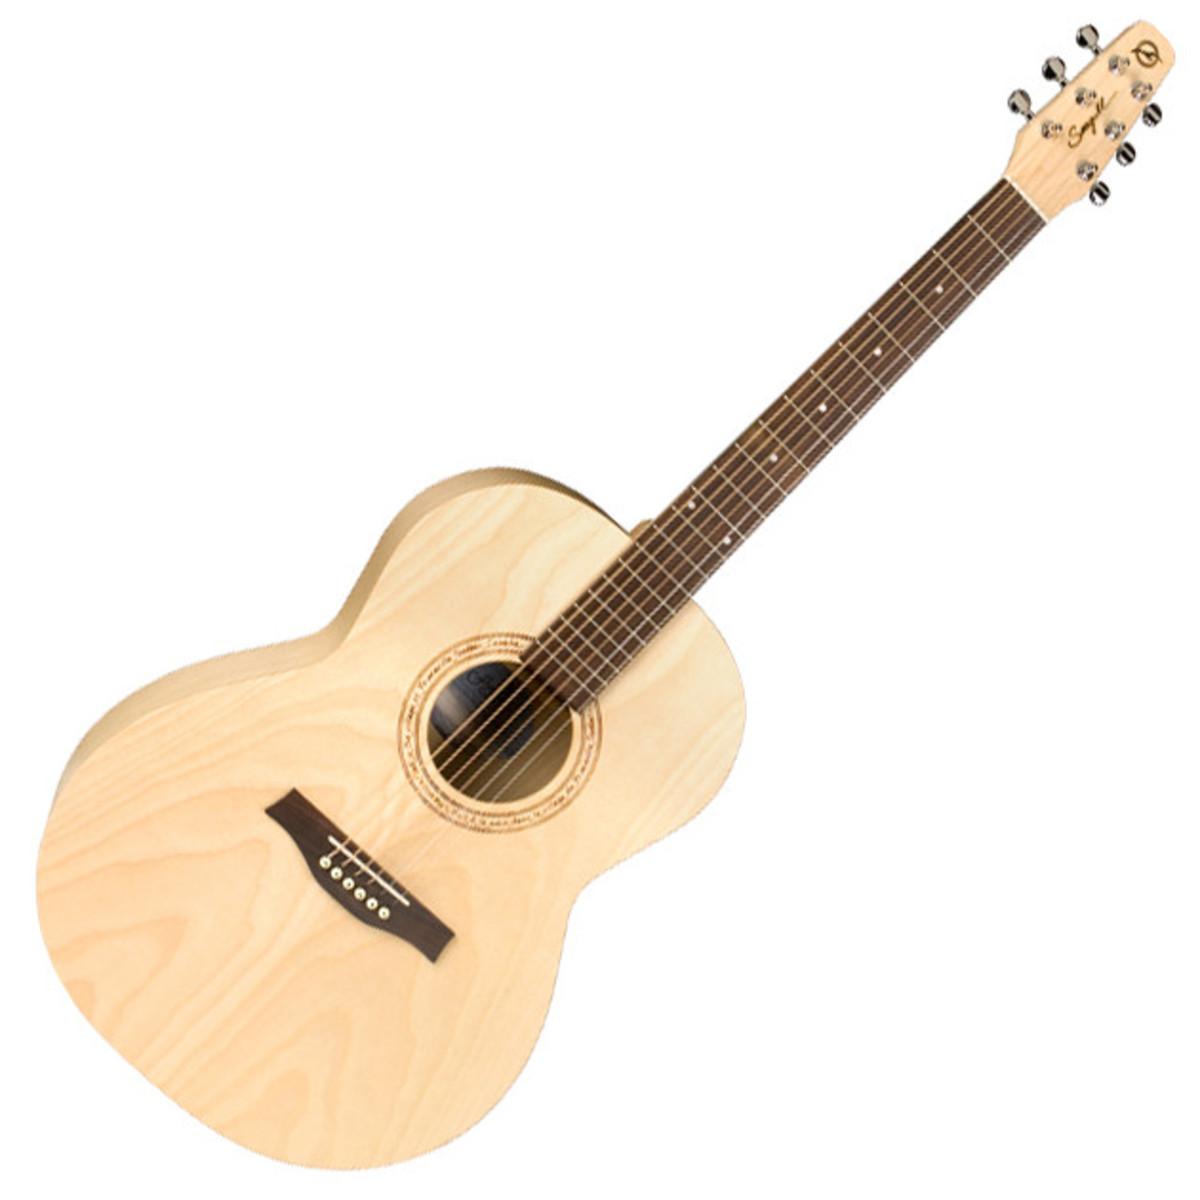 seagull excursion naturel sg folk guitare acoustique de. Black Bedroom Furniture Sets. Home Design Ideas